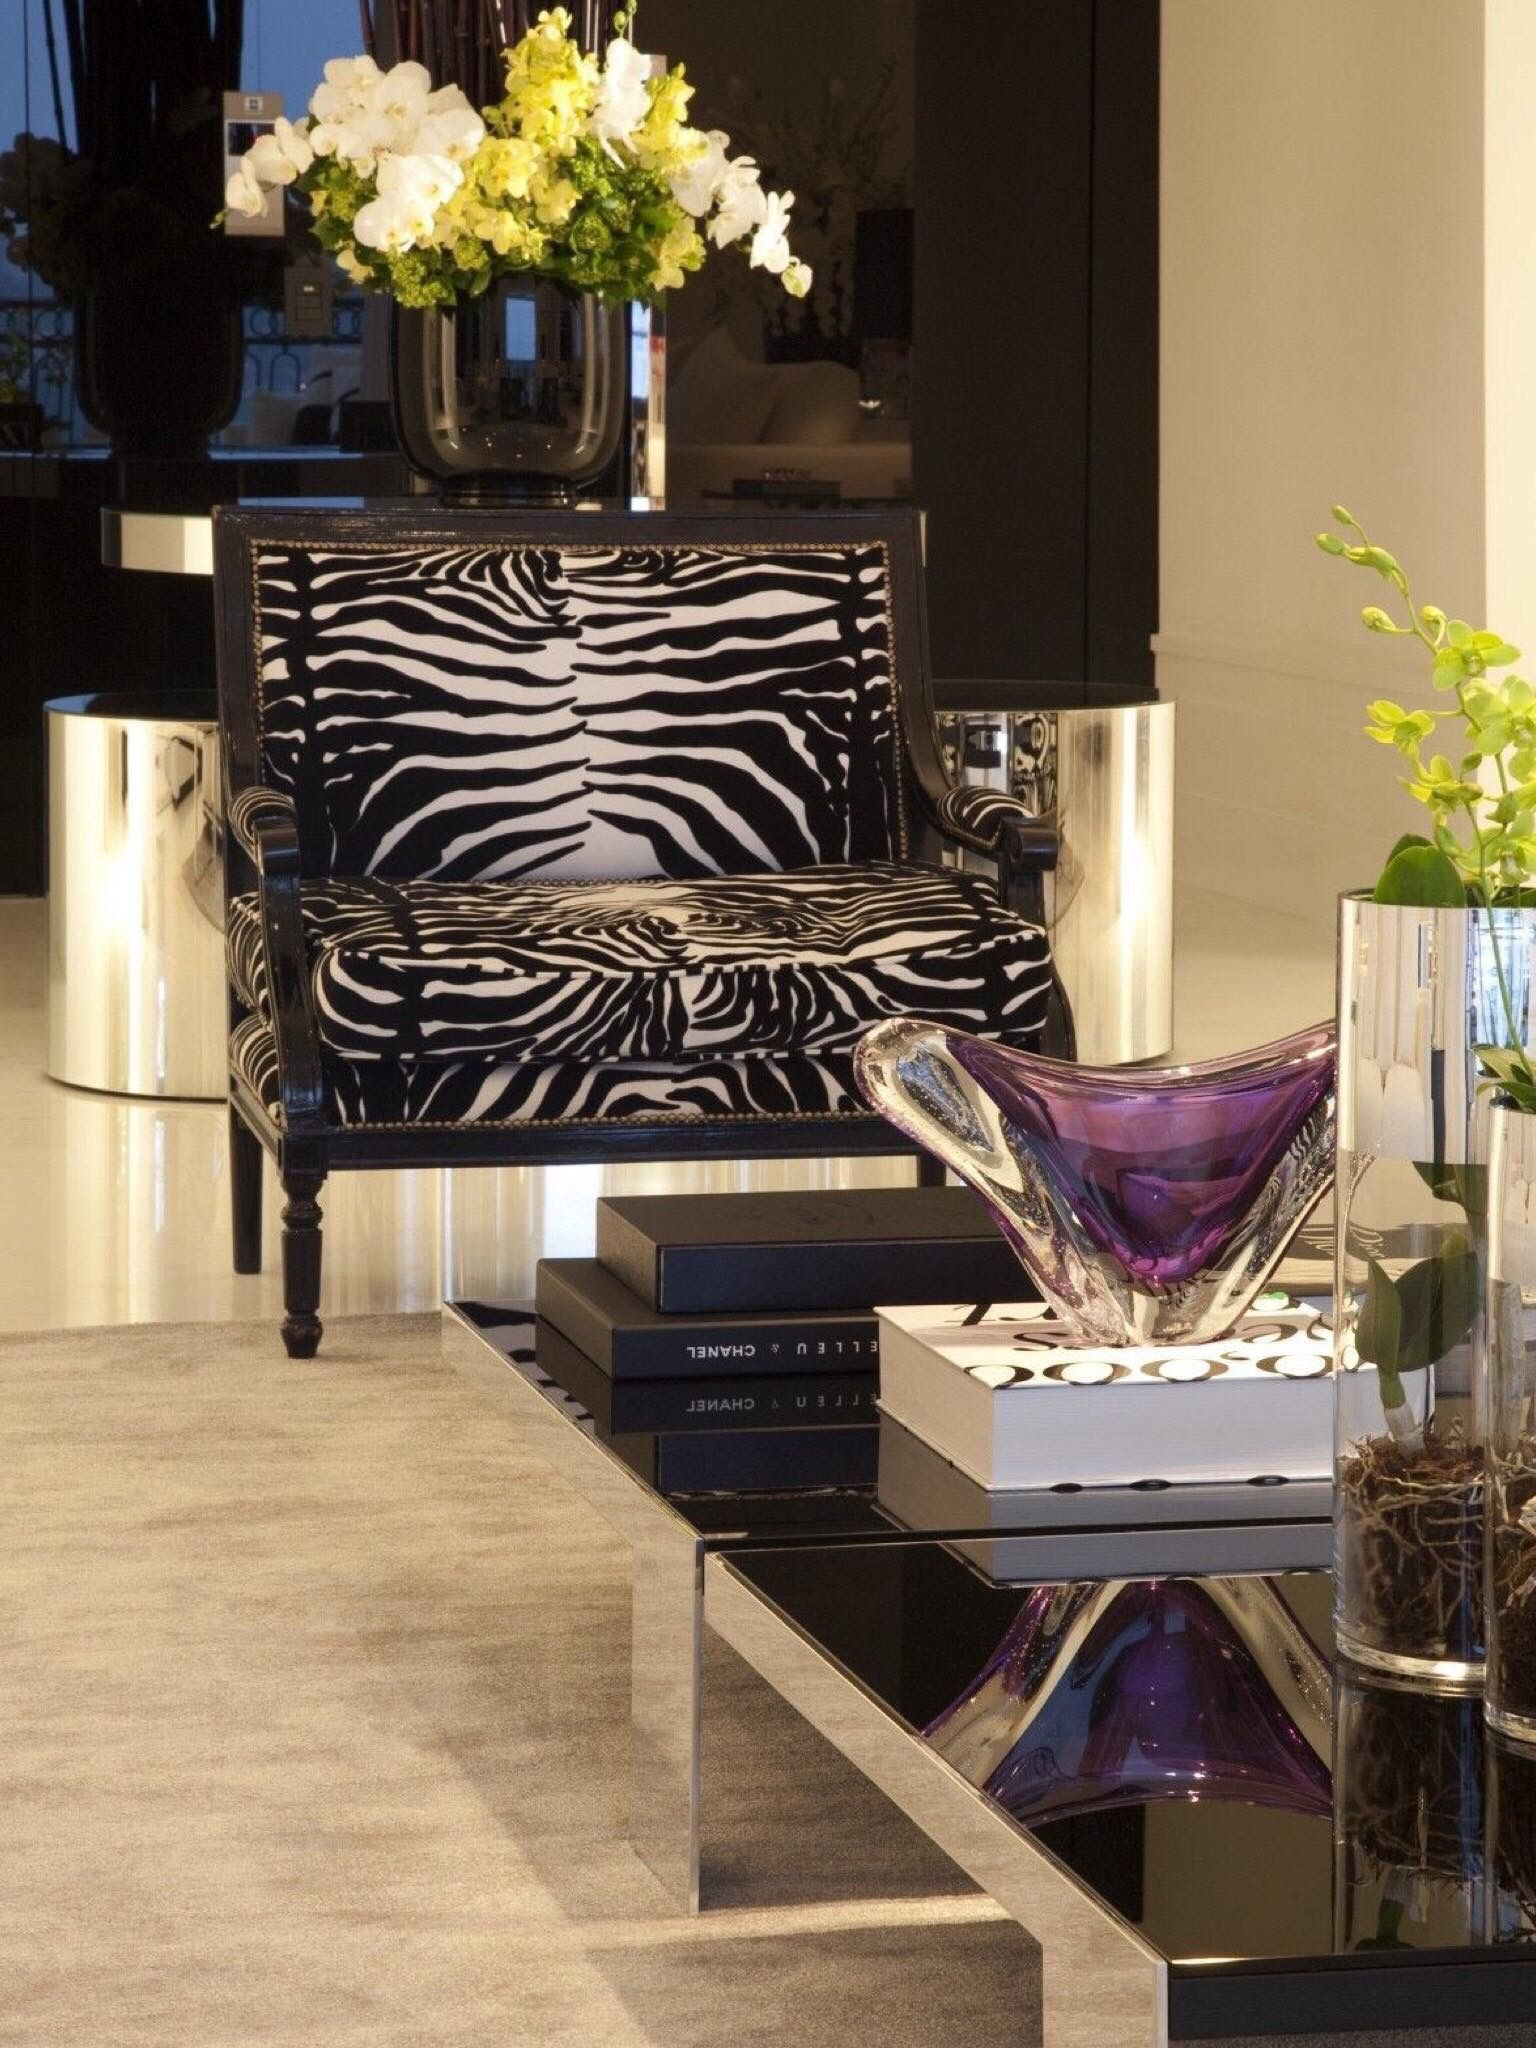 Pin By Kimmie On Home Decor 1 Vignettes Living Room Decor Tips Decor Decor Design